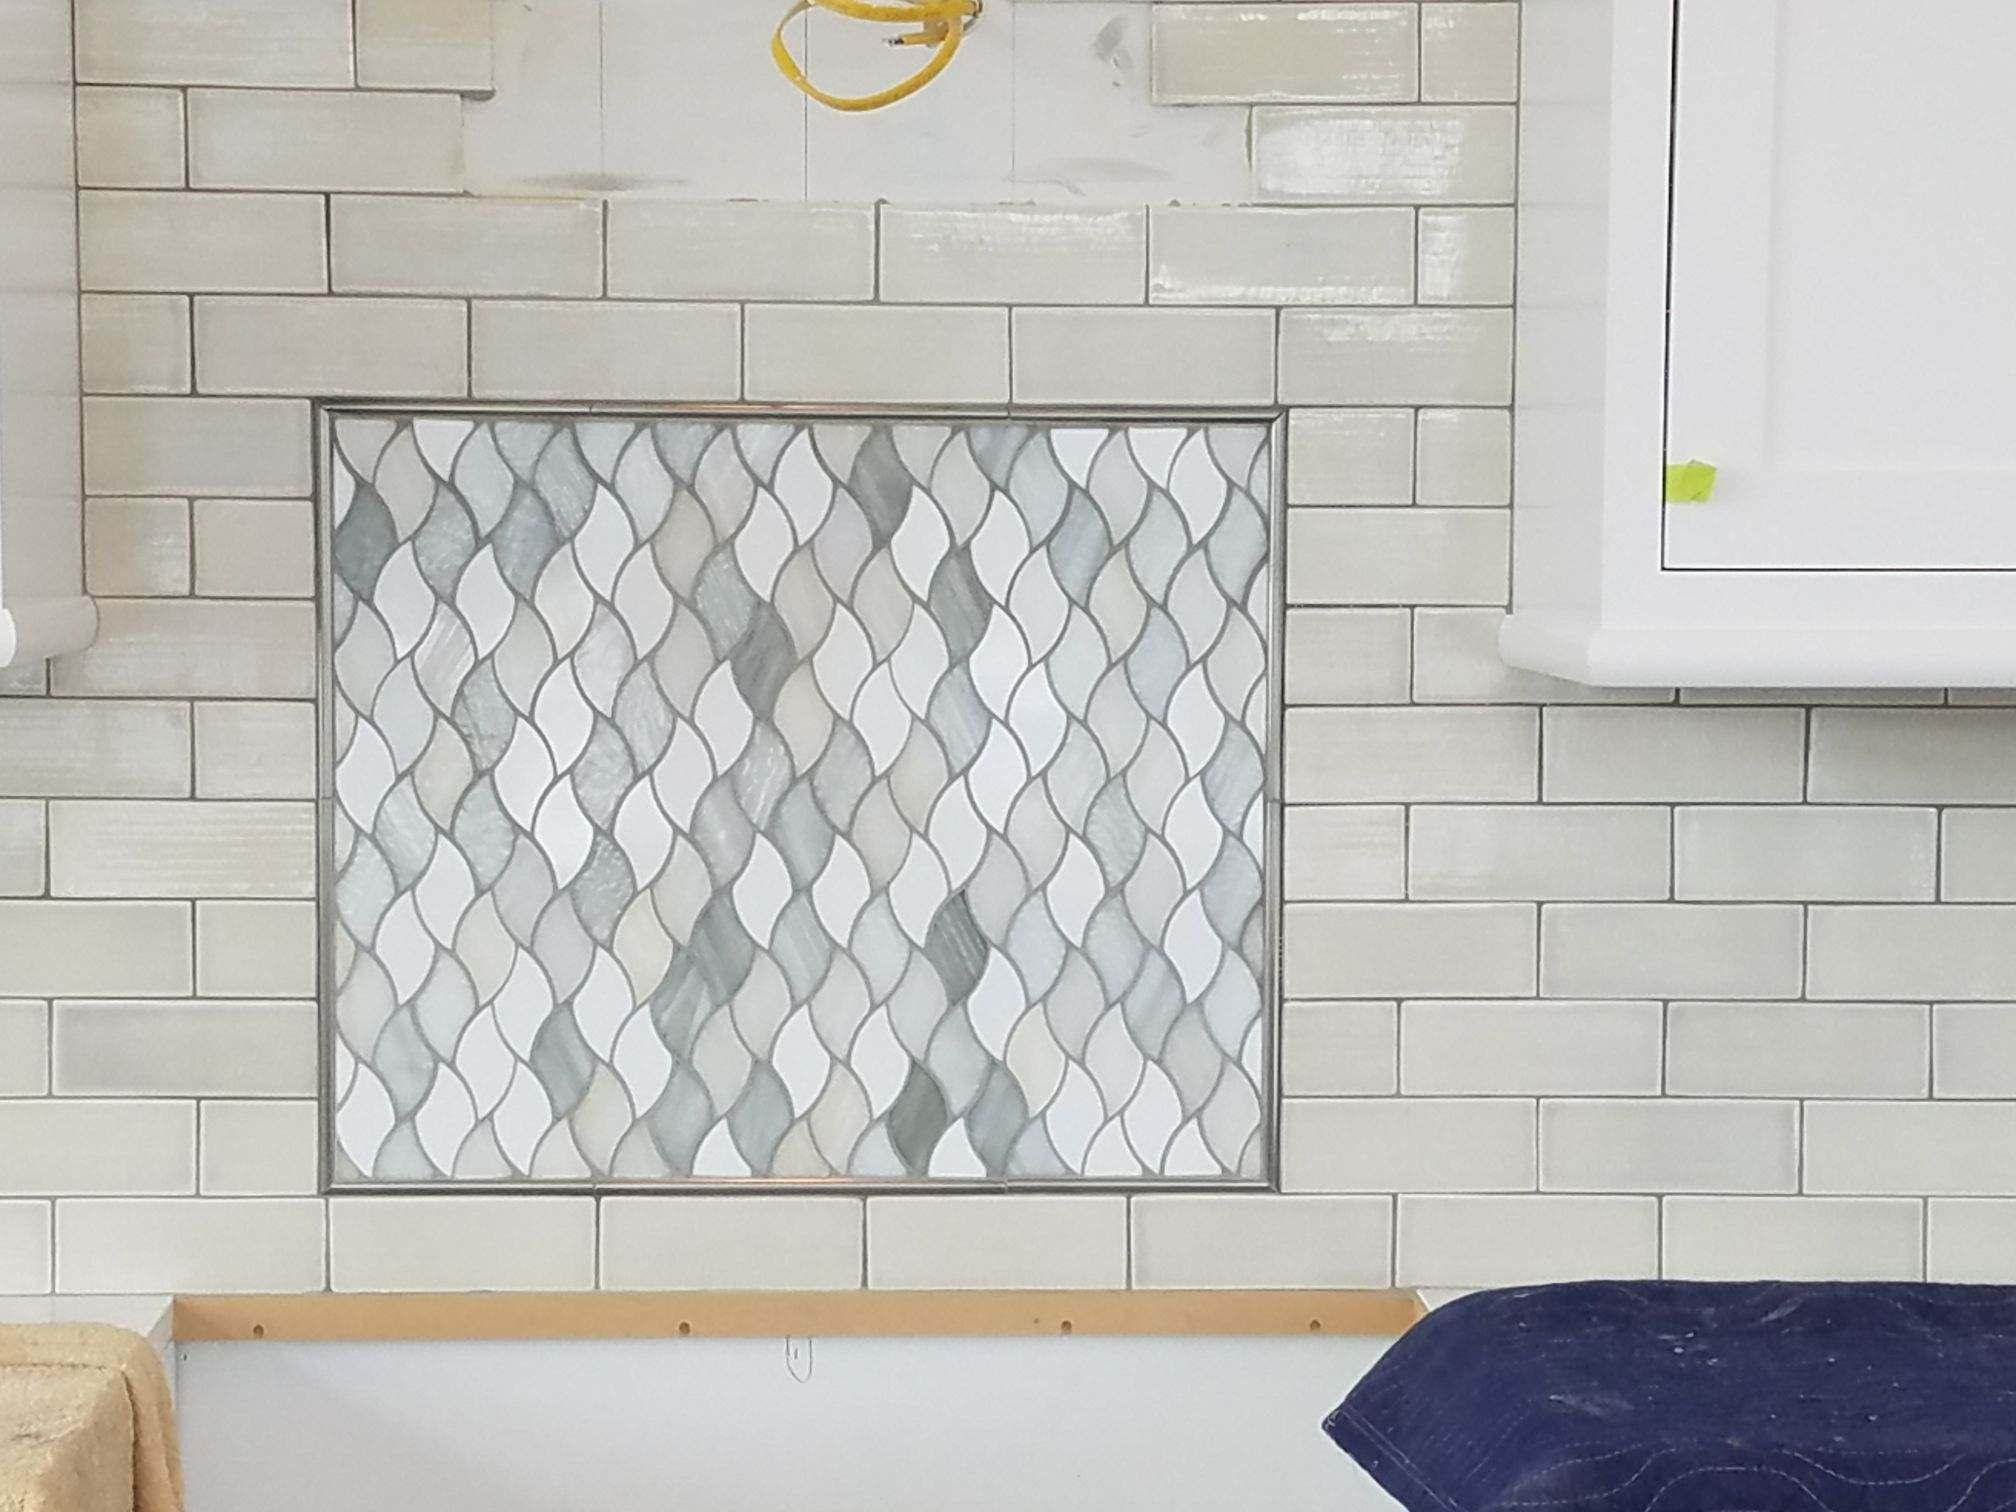 residential backspash- cermaic glass stone mosaic.jpeg